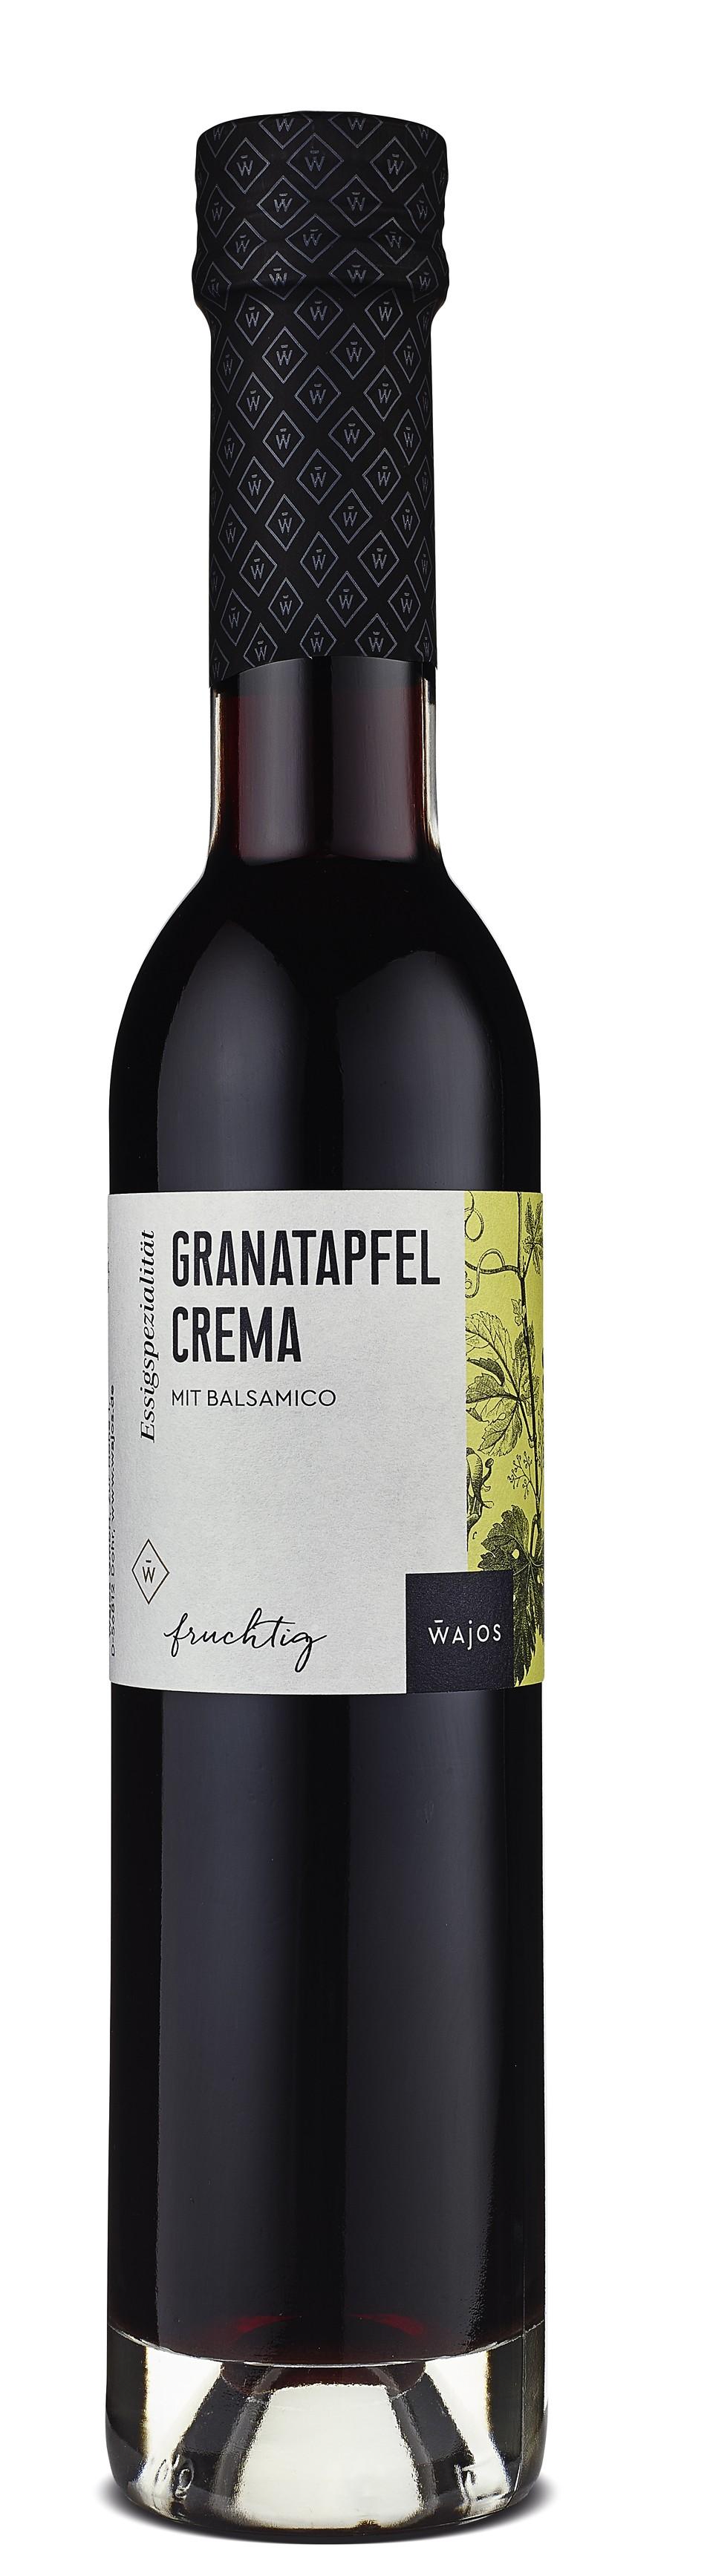 Granatapfel Crema 250ml